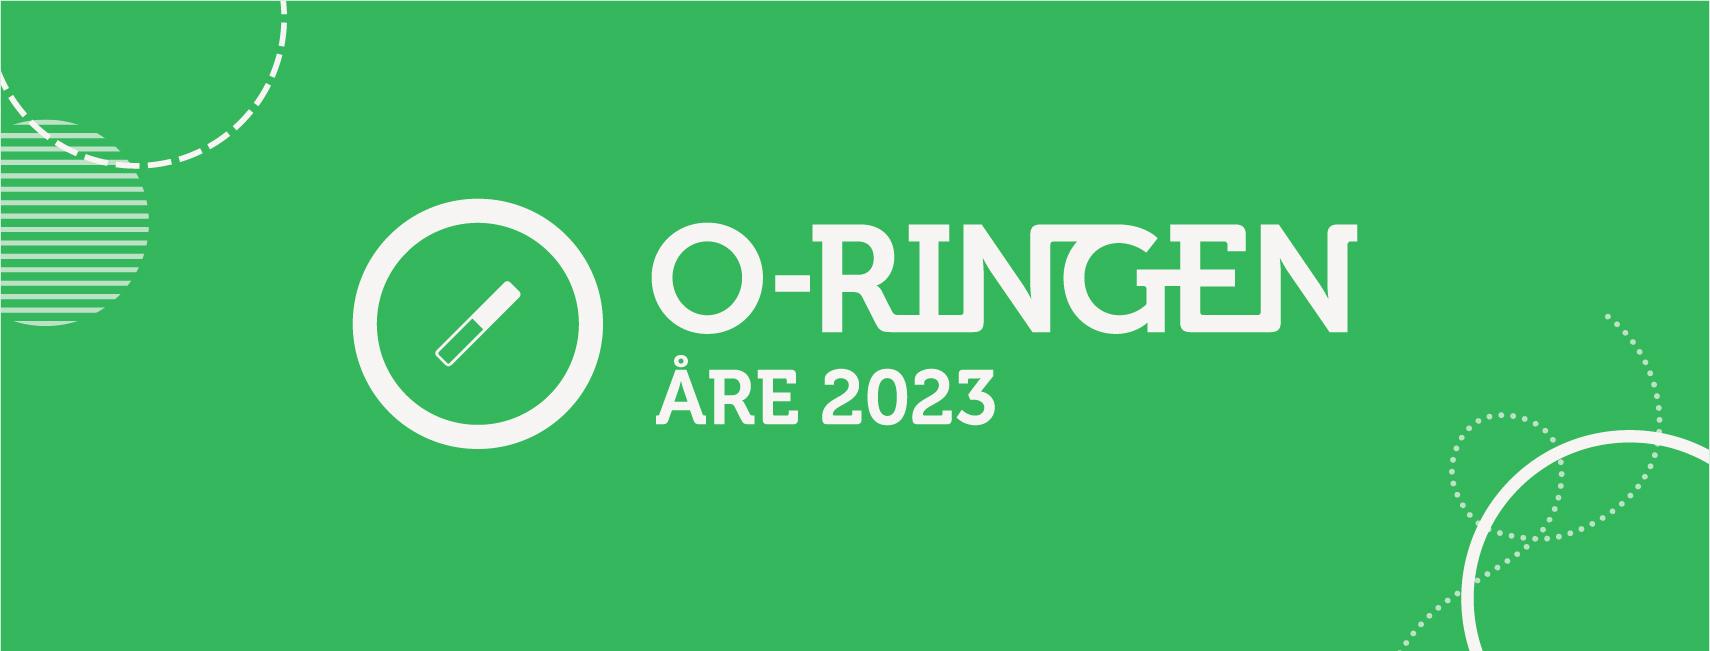 Åre 2023